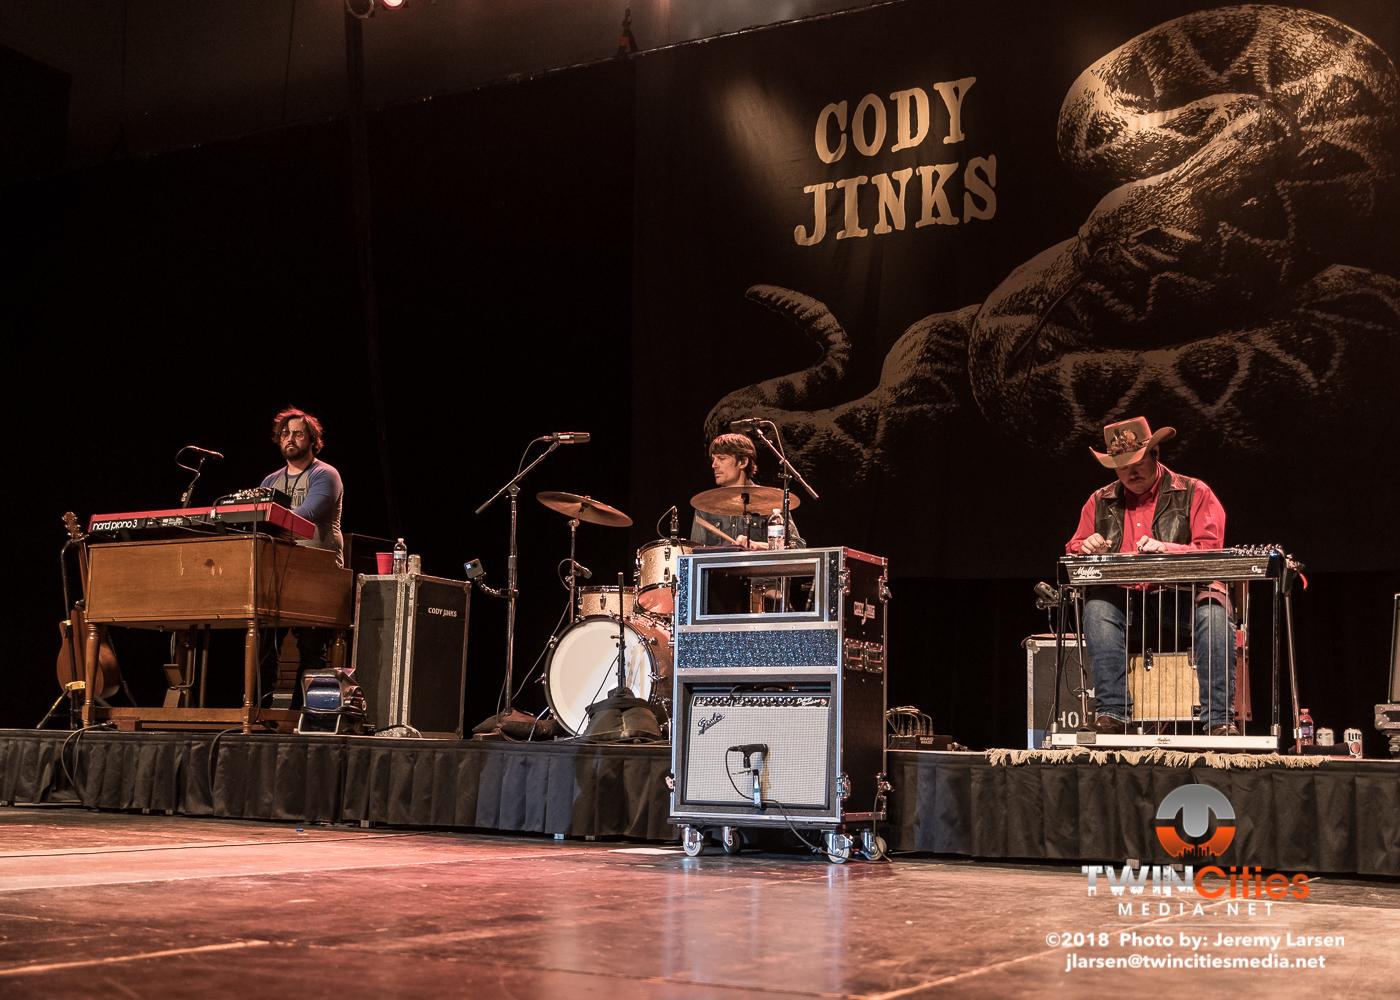 Cody-Jinks-Verizon-Grand-Hall-3-22-19-24